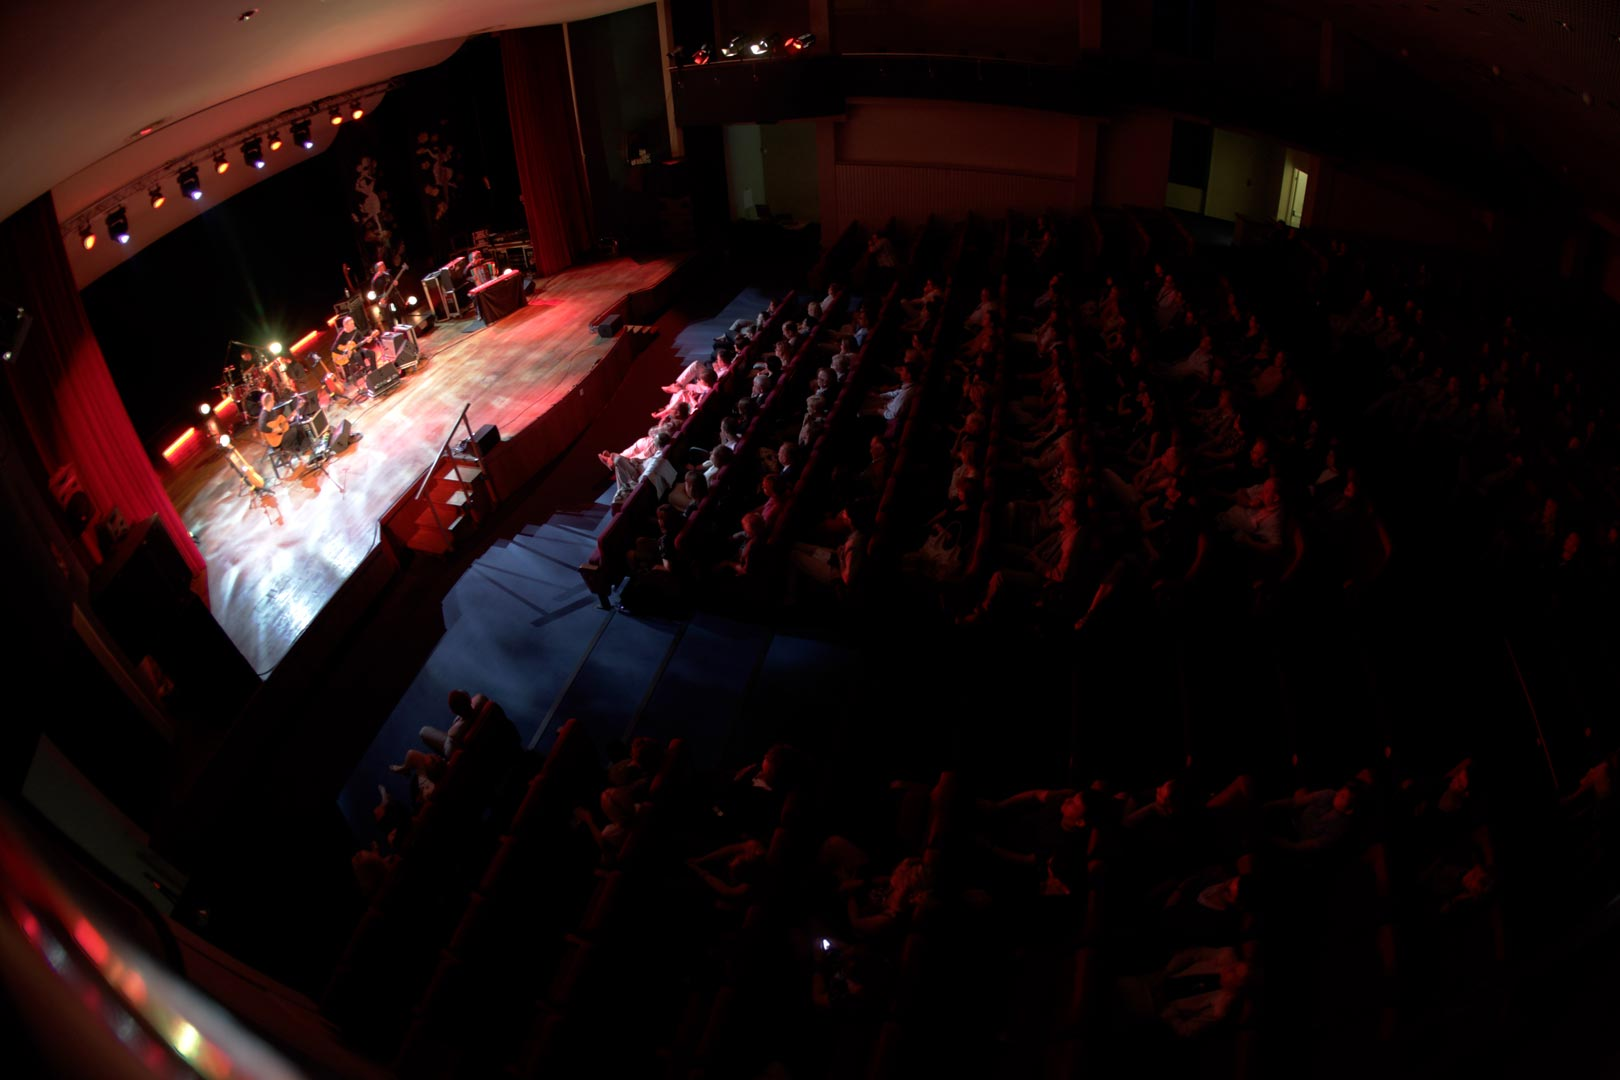 038-event_concert